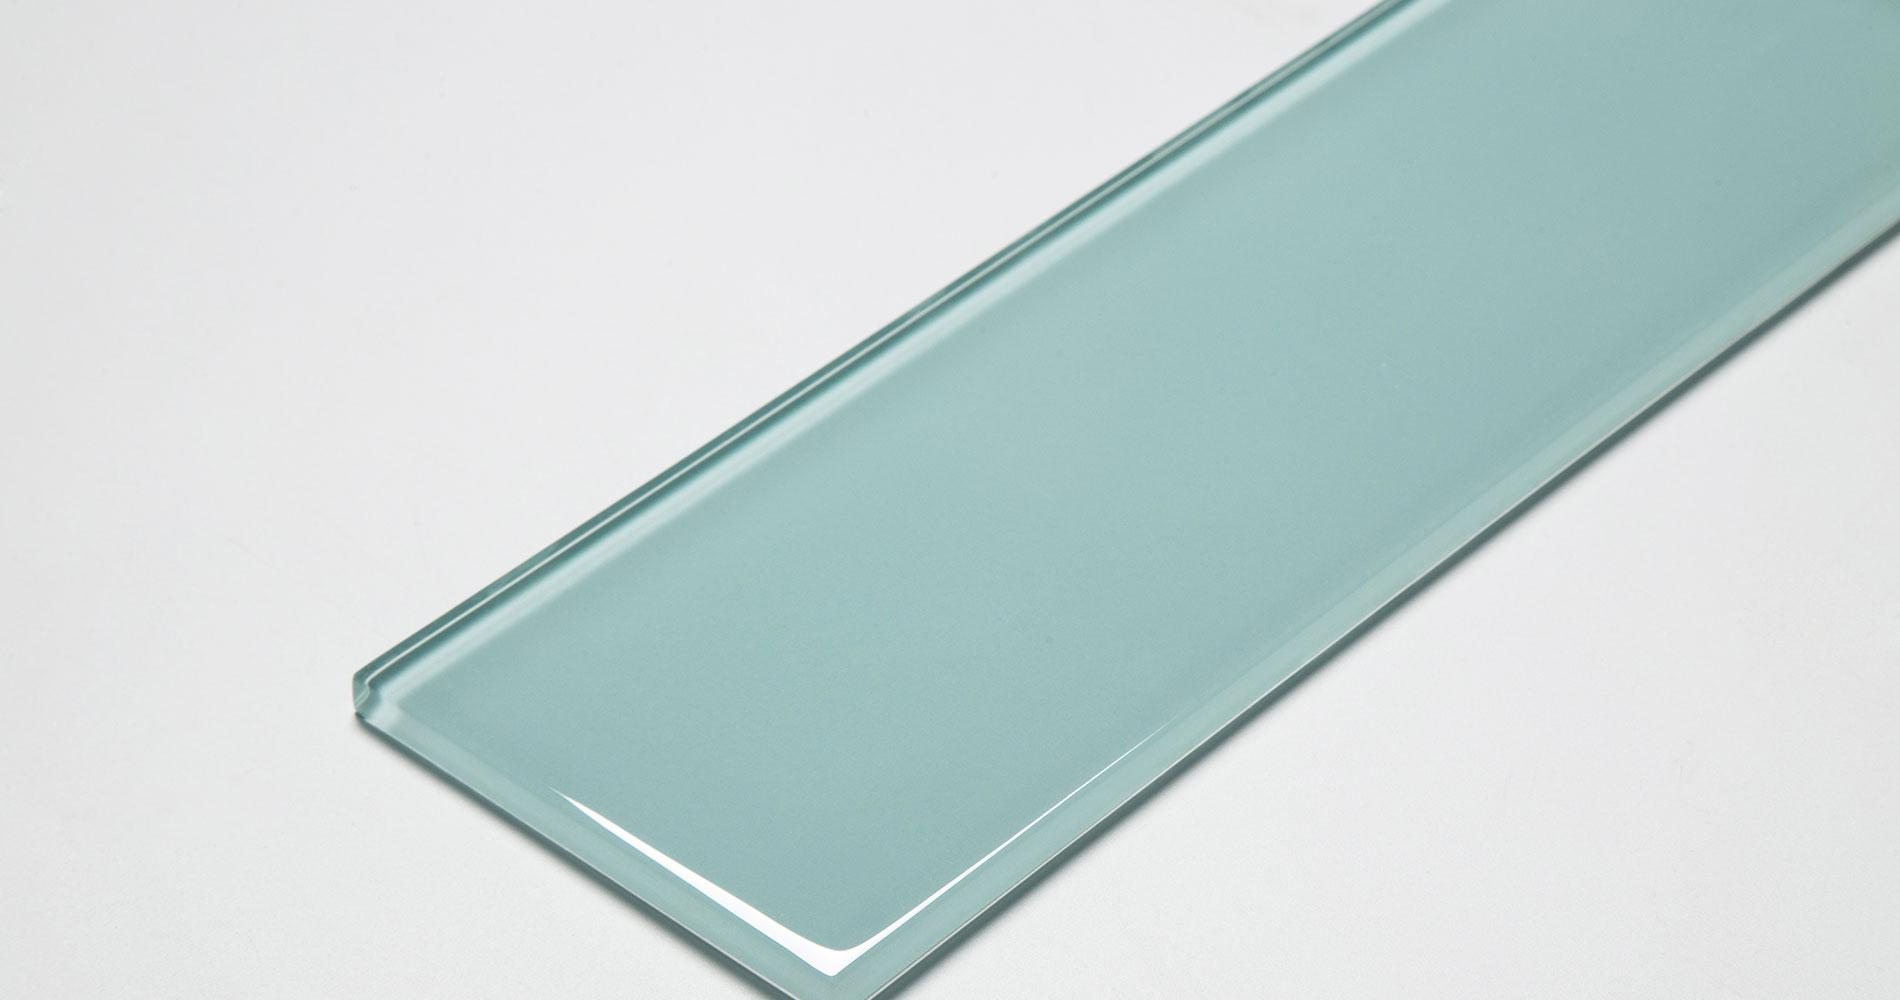 Century-Mosaic-Crystal-Glass-3inchX8inch-Brick-Mosaic-Tile-Collection-22